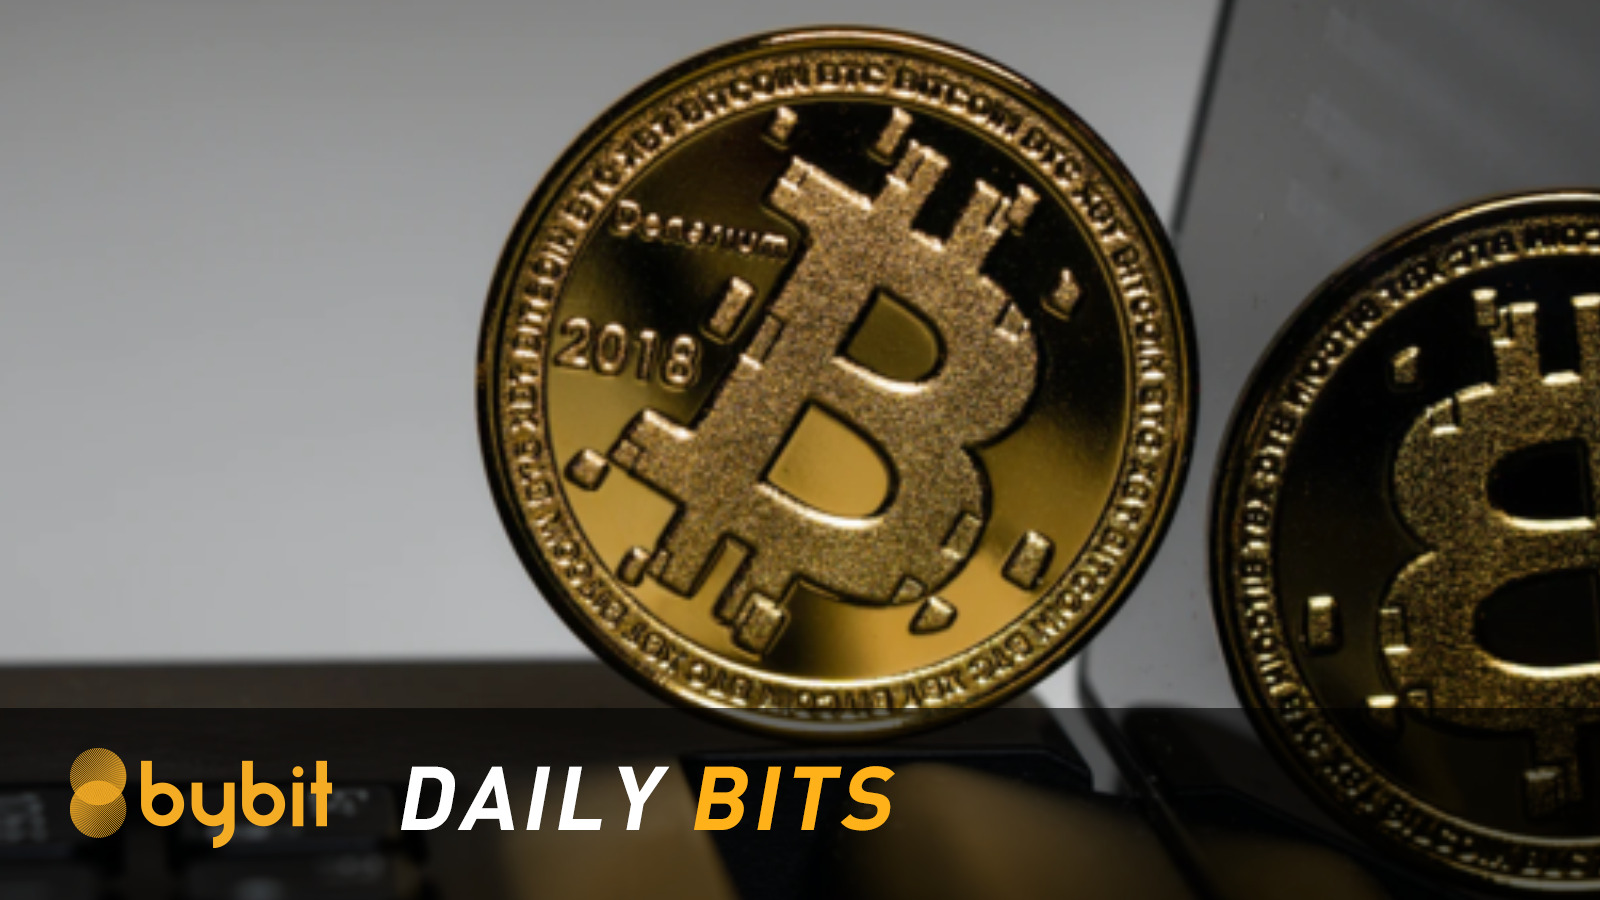 Daily Bits BTC